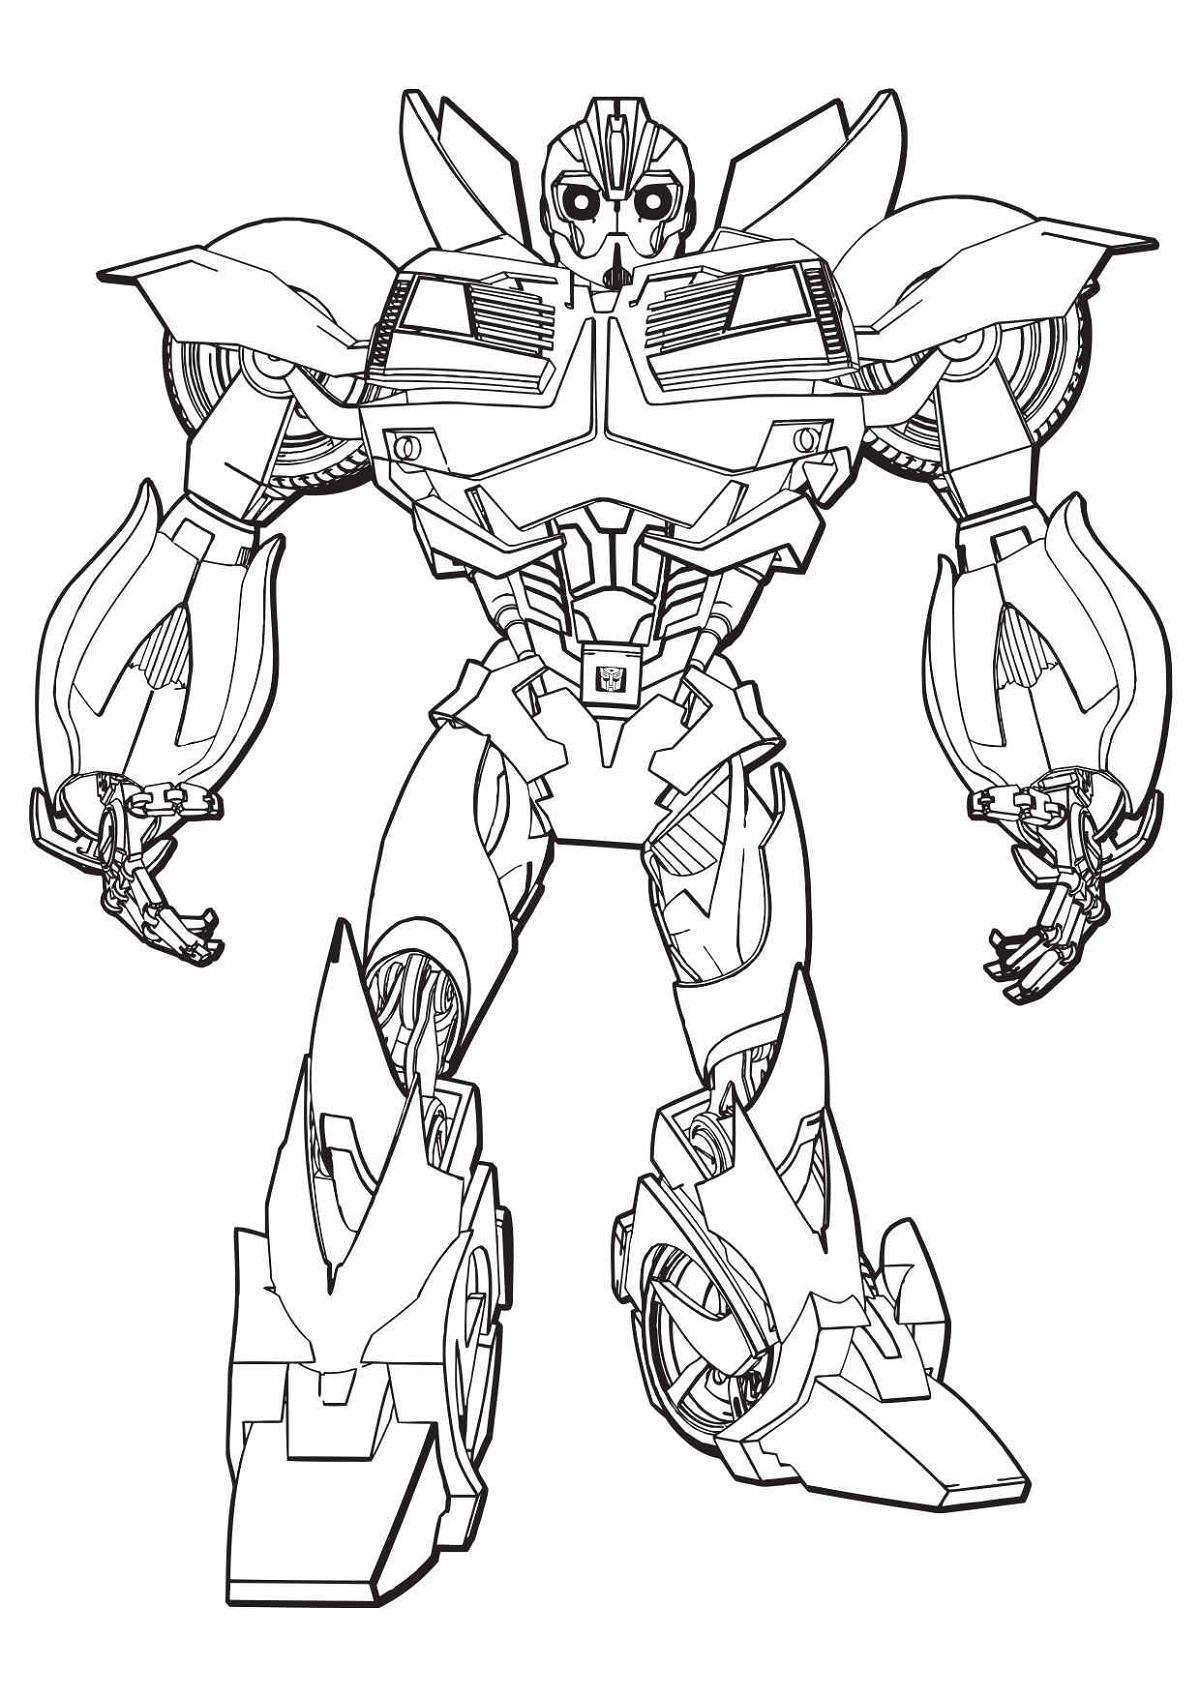 Worksheet Bumble Bee Transformers